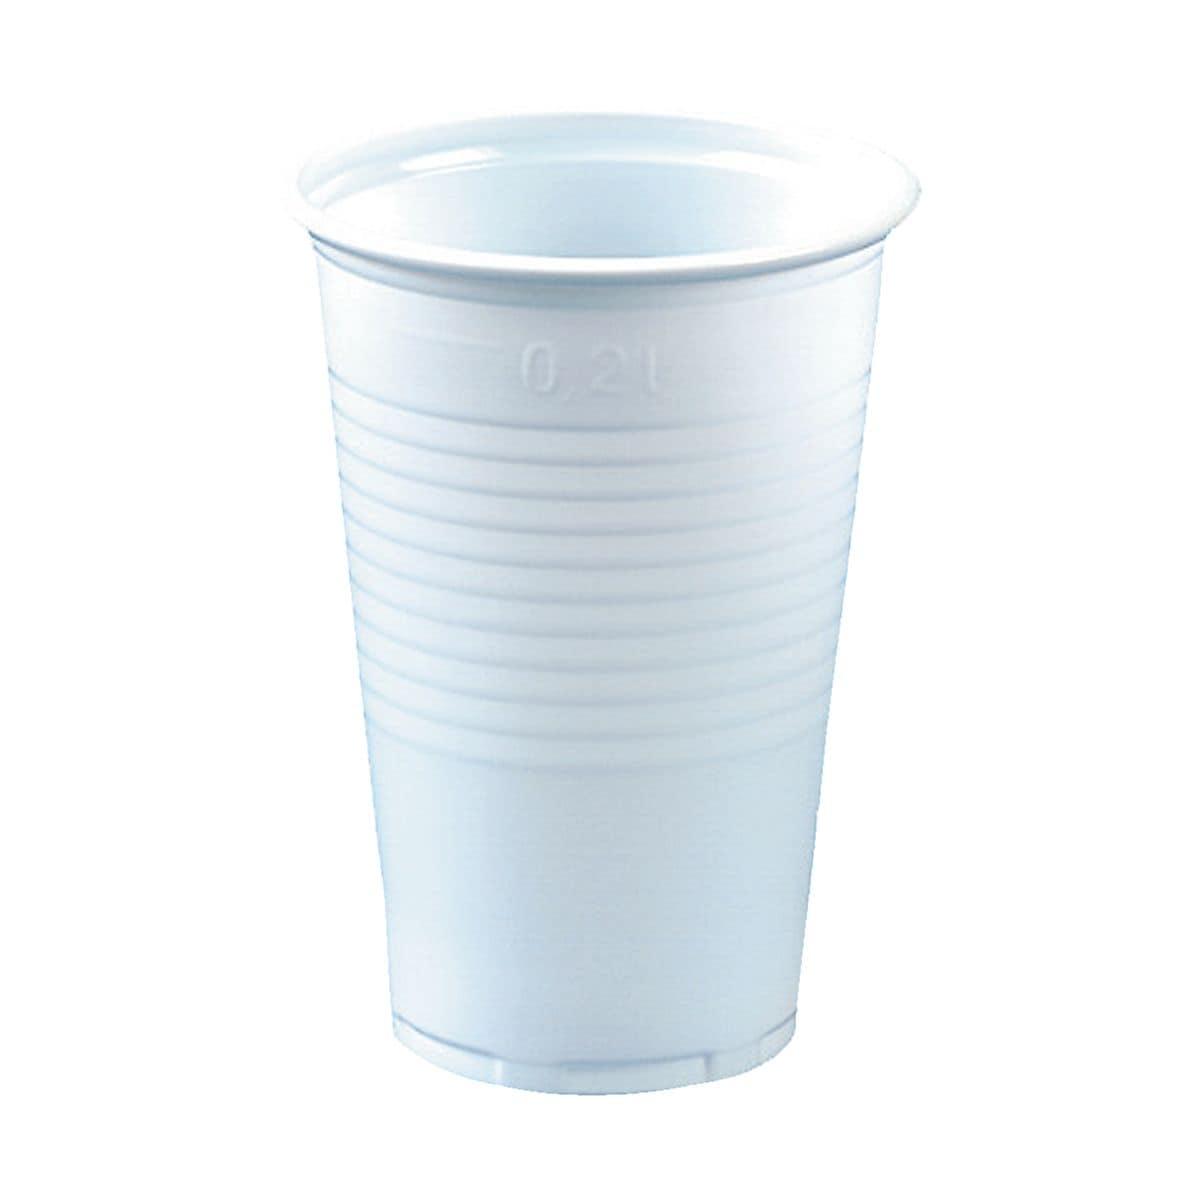 Papstar 100er-Pack Einweg-Trinkbecher 0,2L weiß